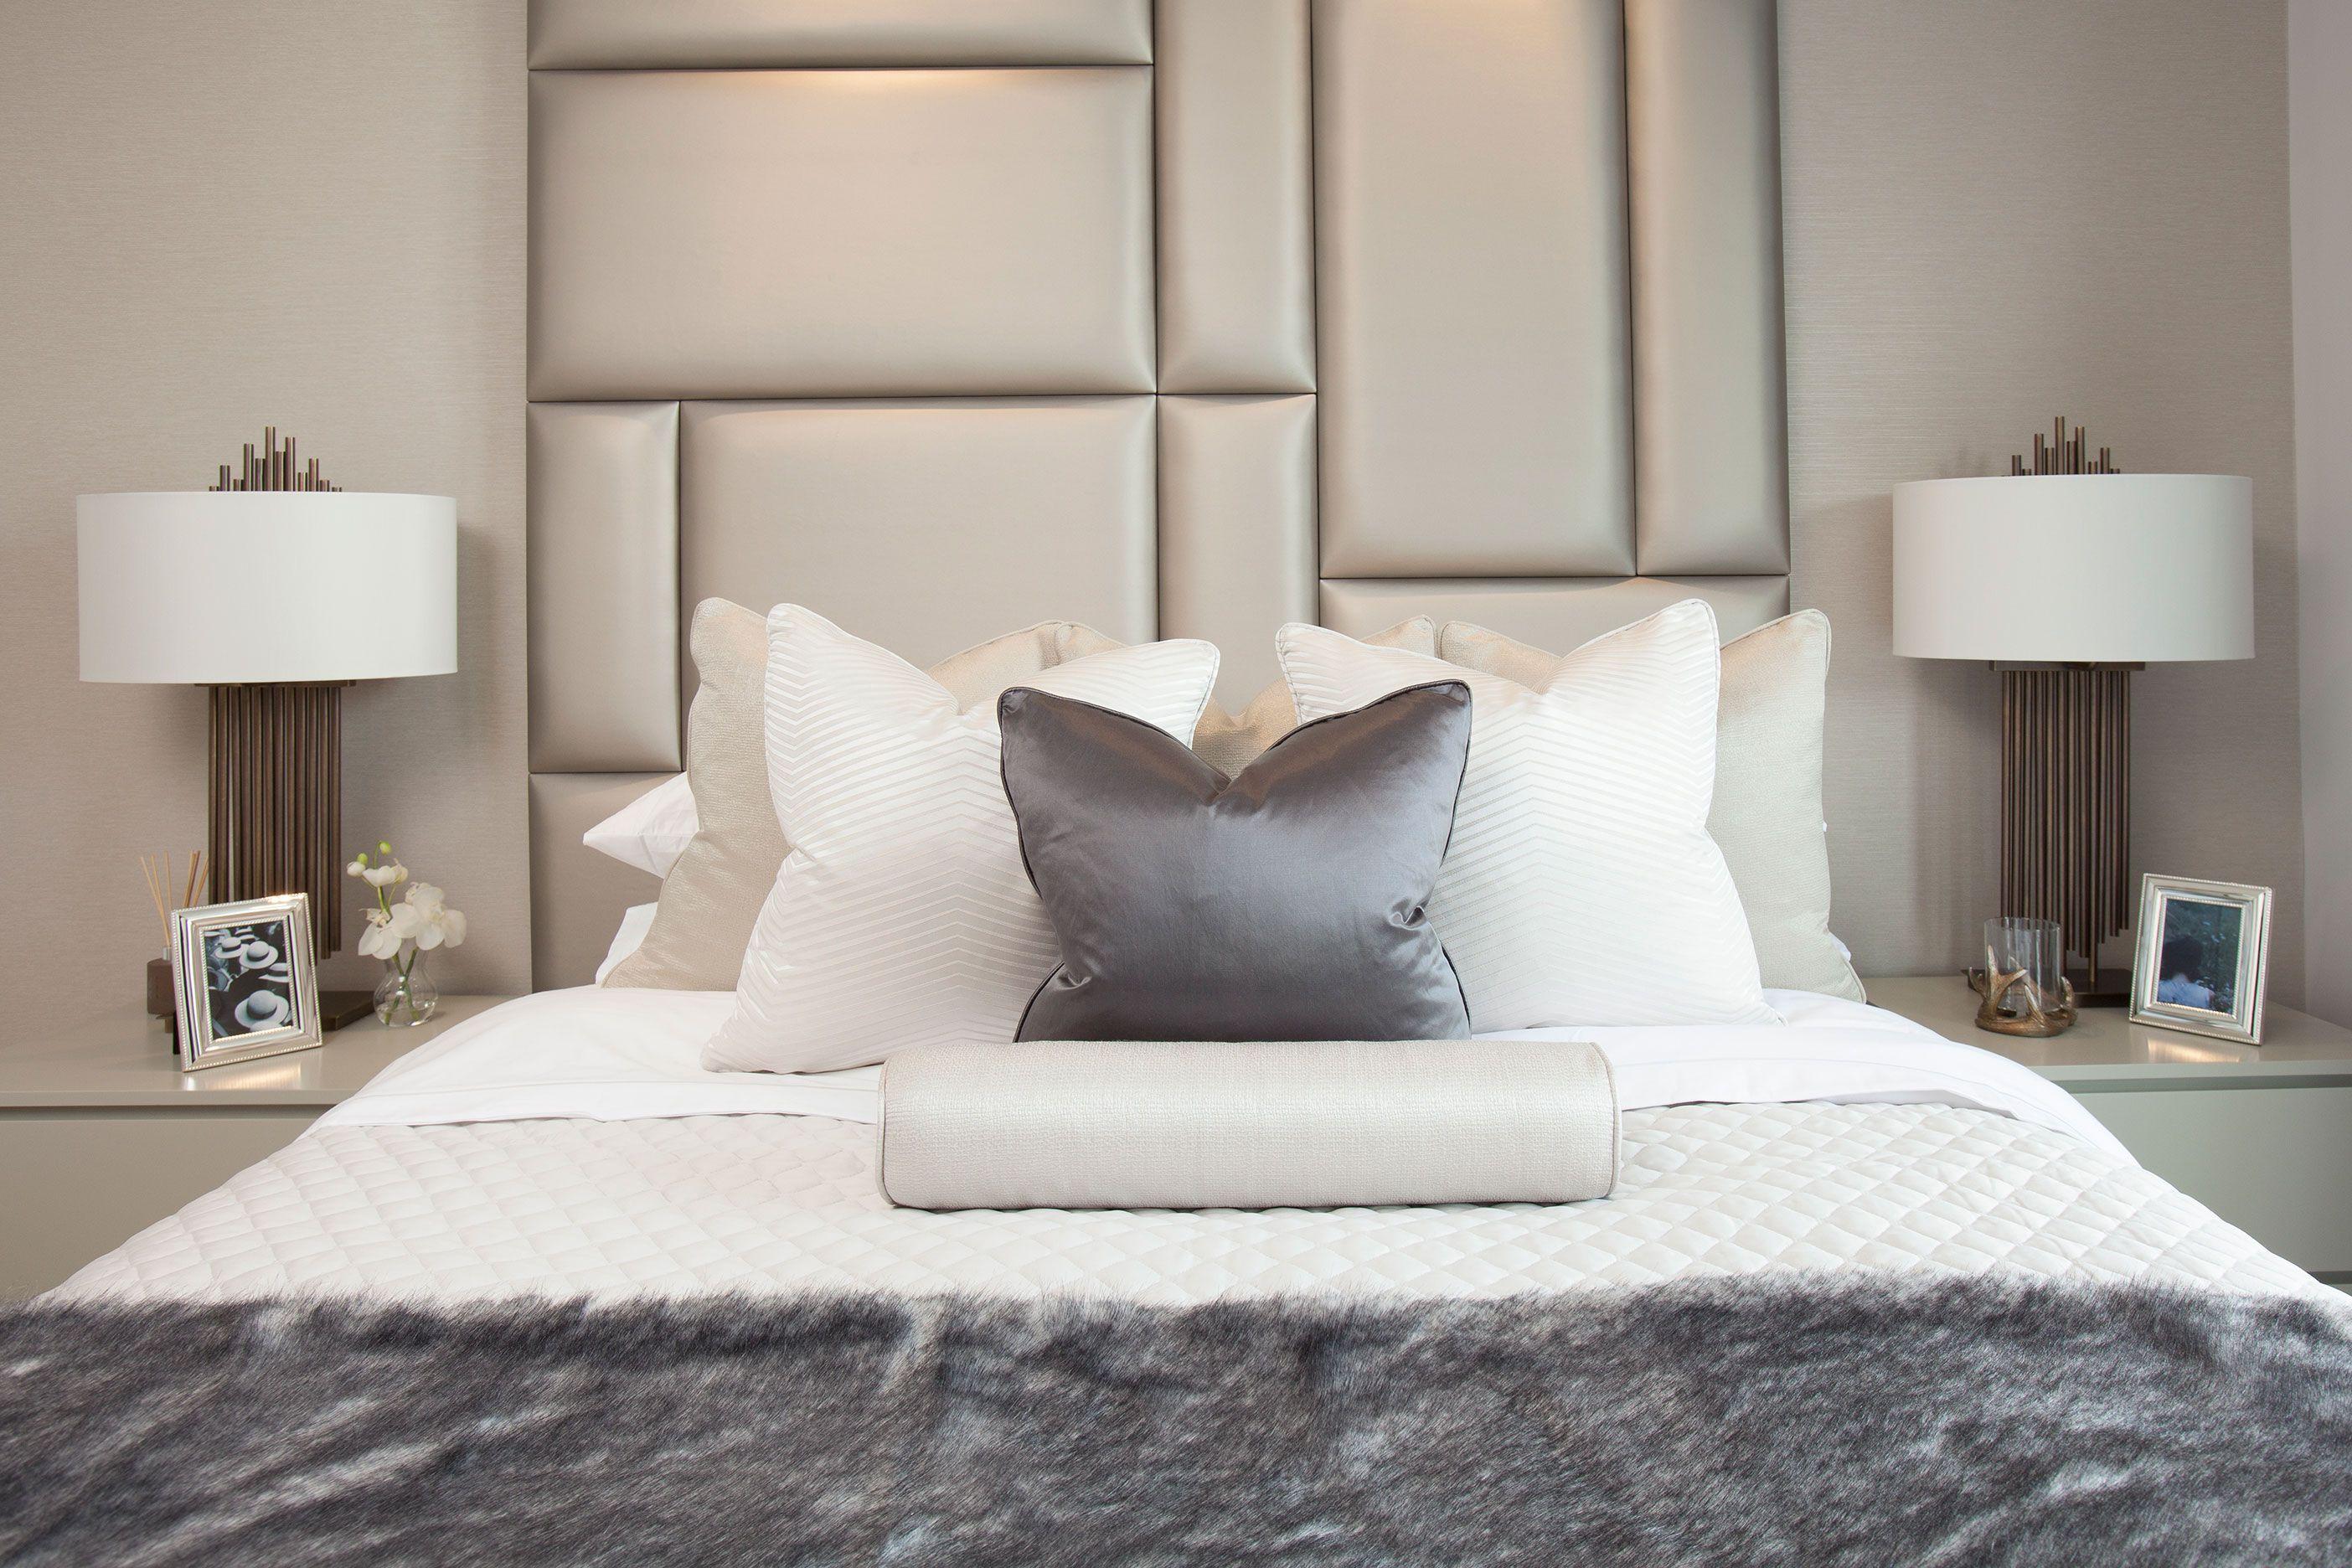 Interiors Photography Bedroom Interior Design Headboard Cushions Bedroom Interior Tile Bedroom Guest Bedroom Decor